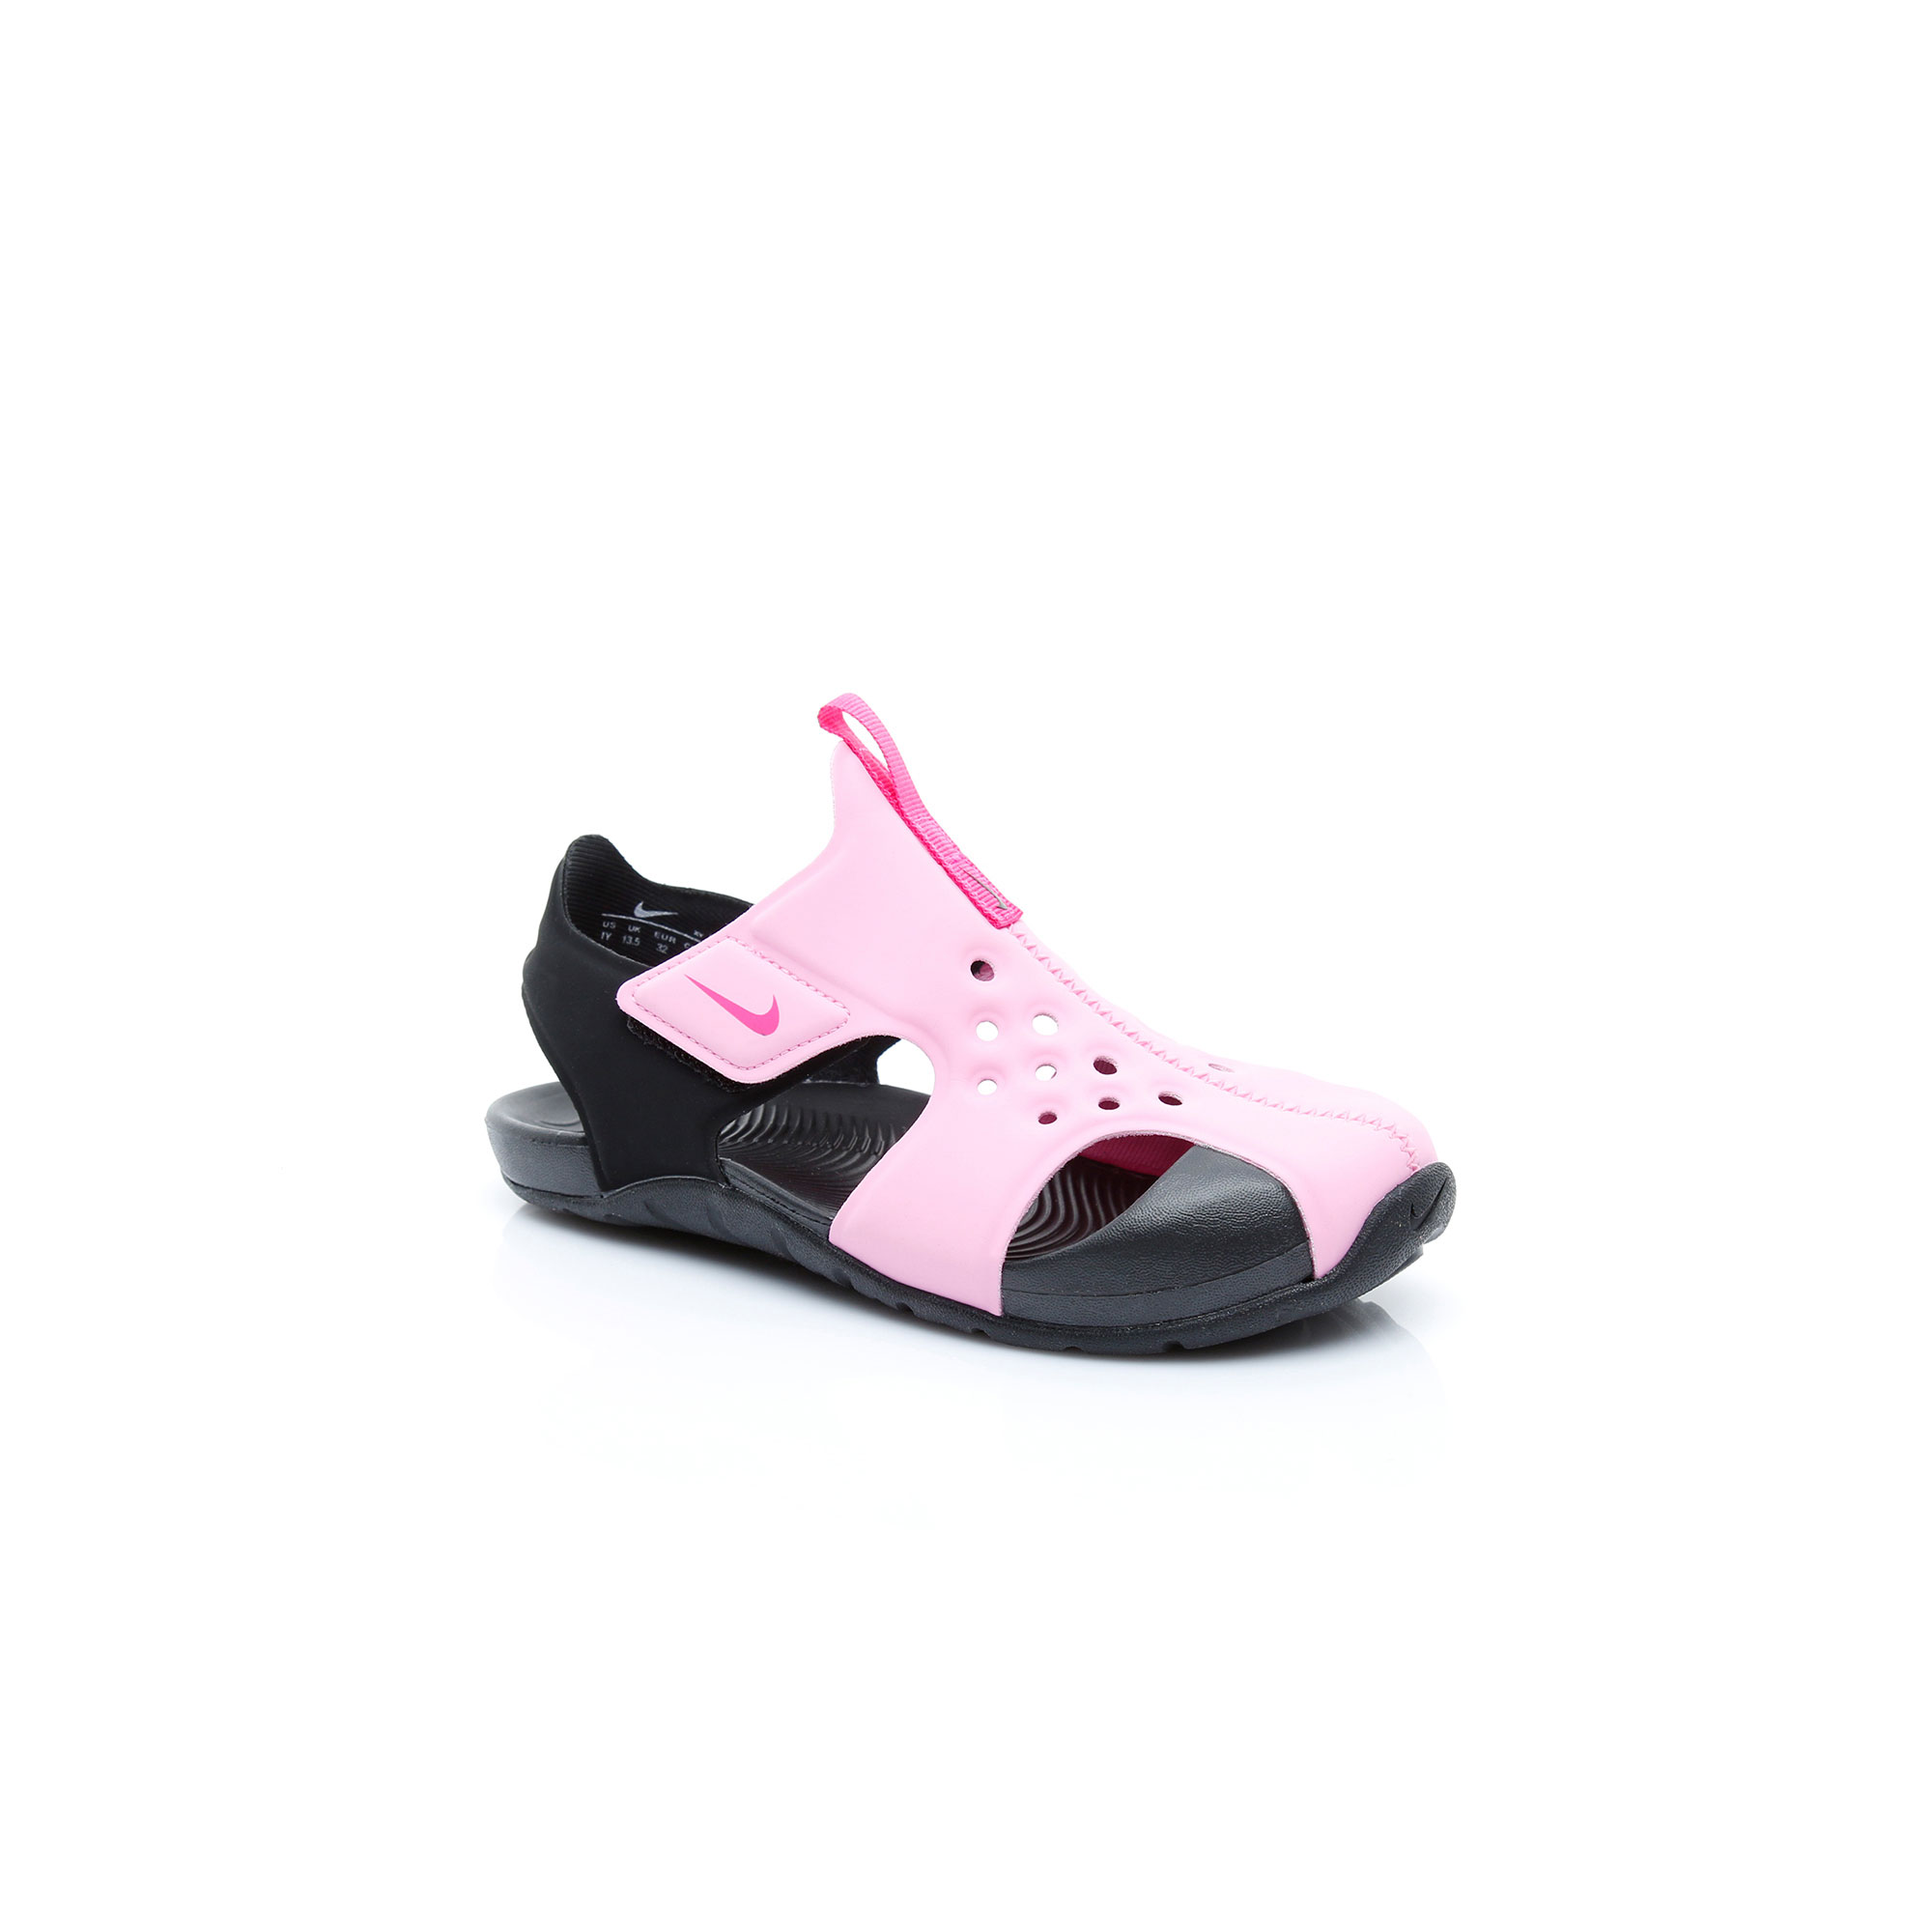 Nike Sunray Protect 2 Çocuk Pembe Sandalet